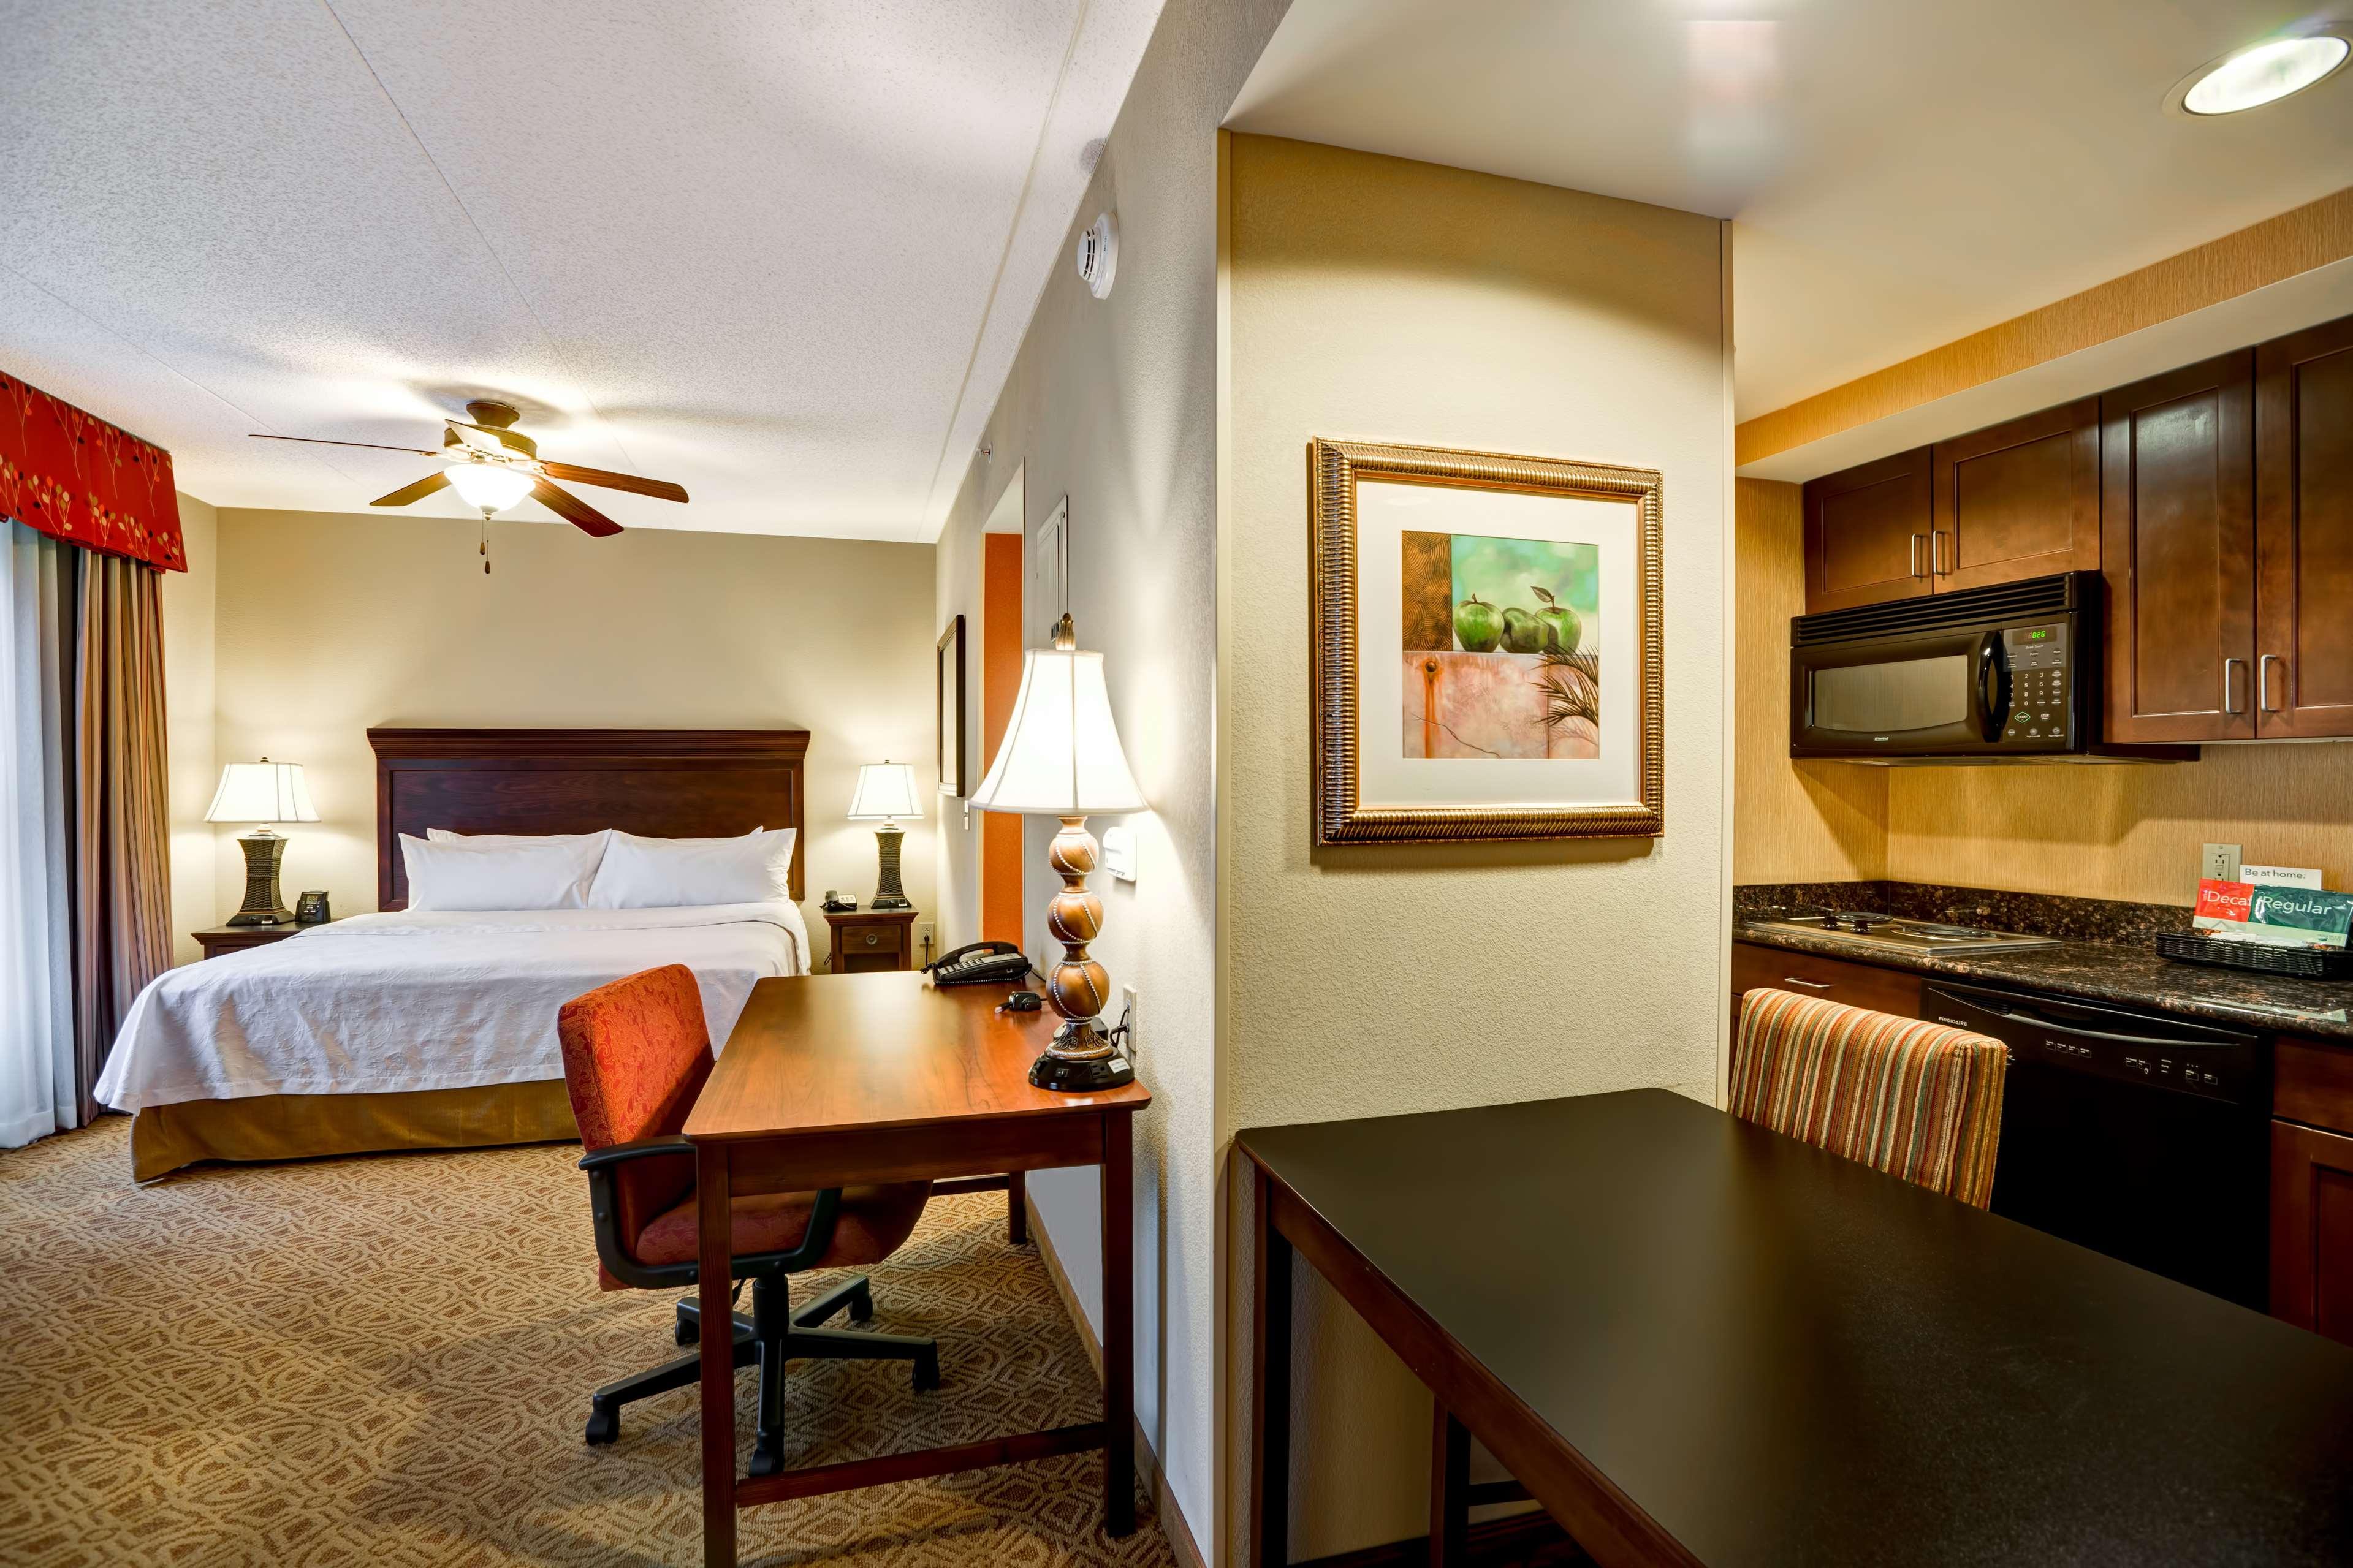 Homewood Suites by Hilton Fredericksburg image 22